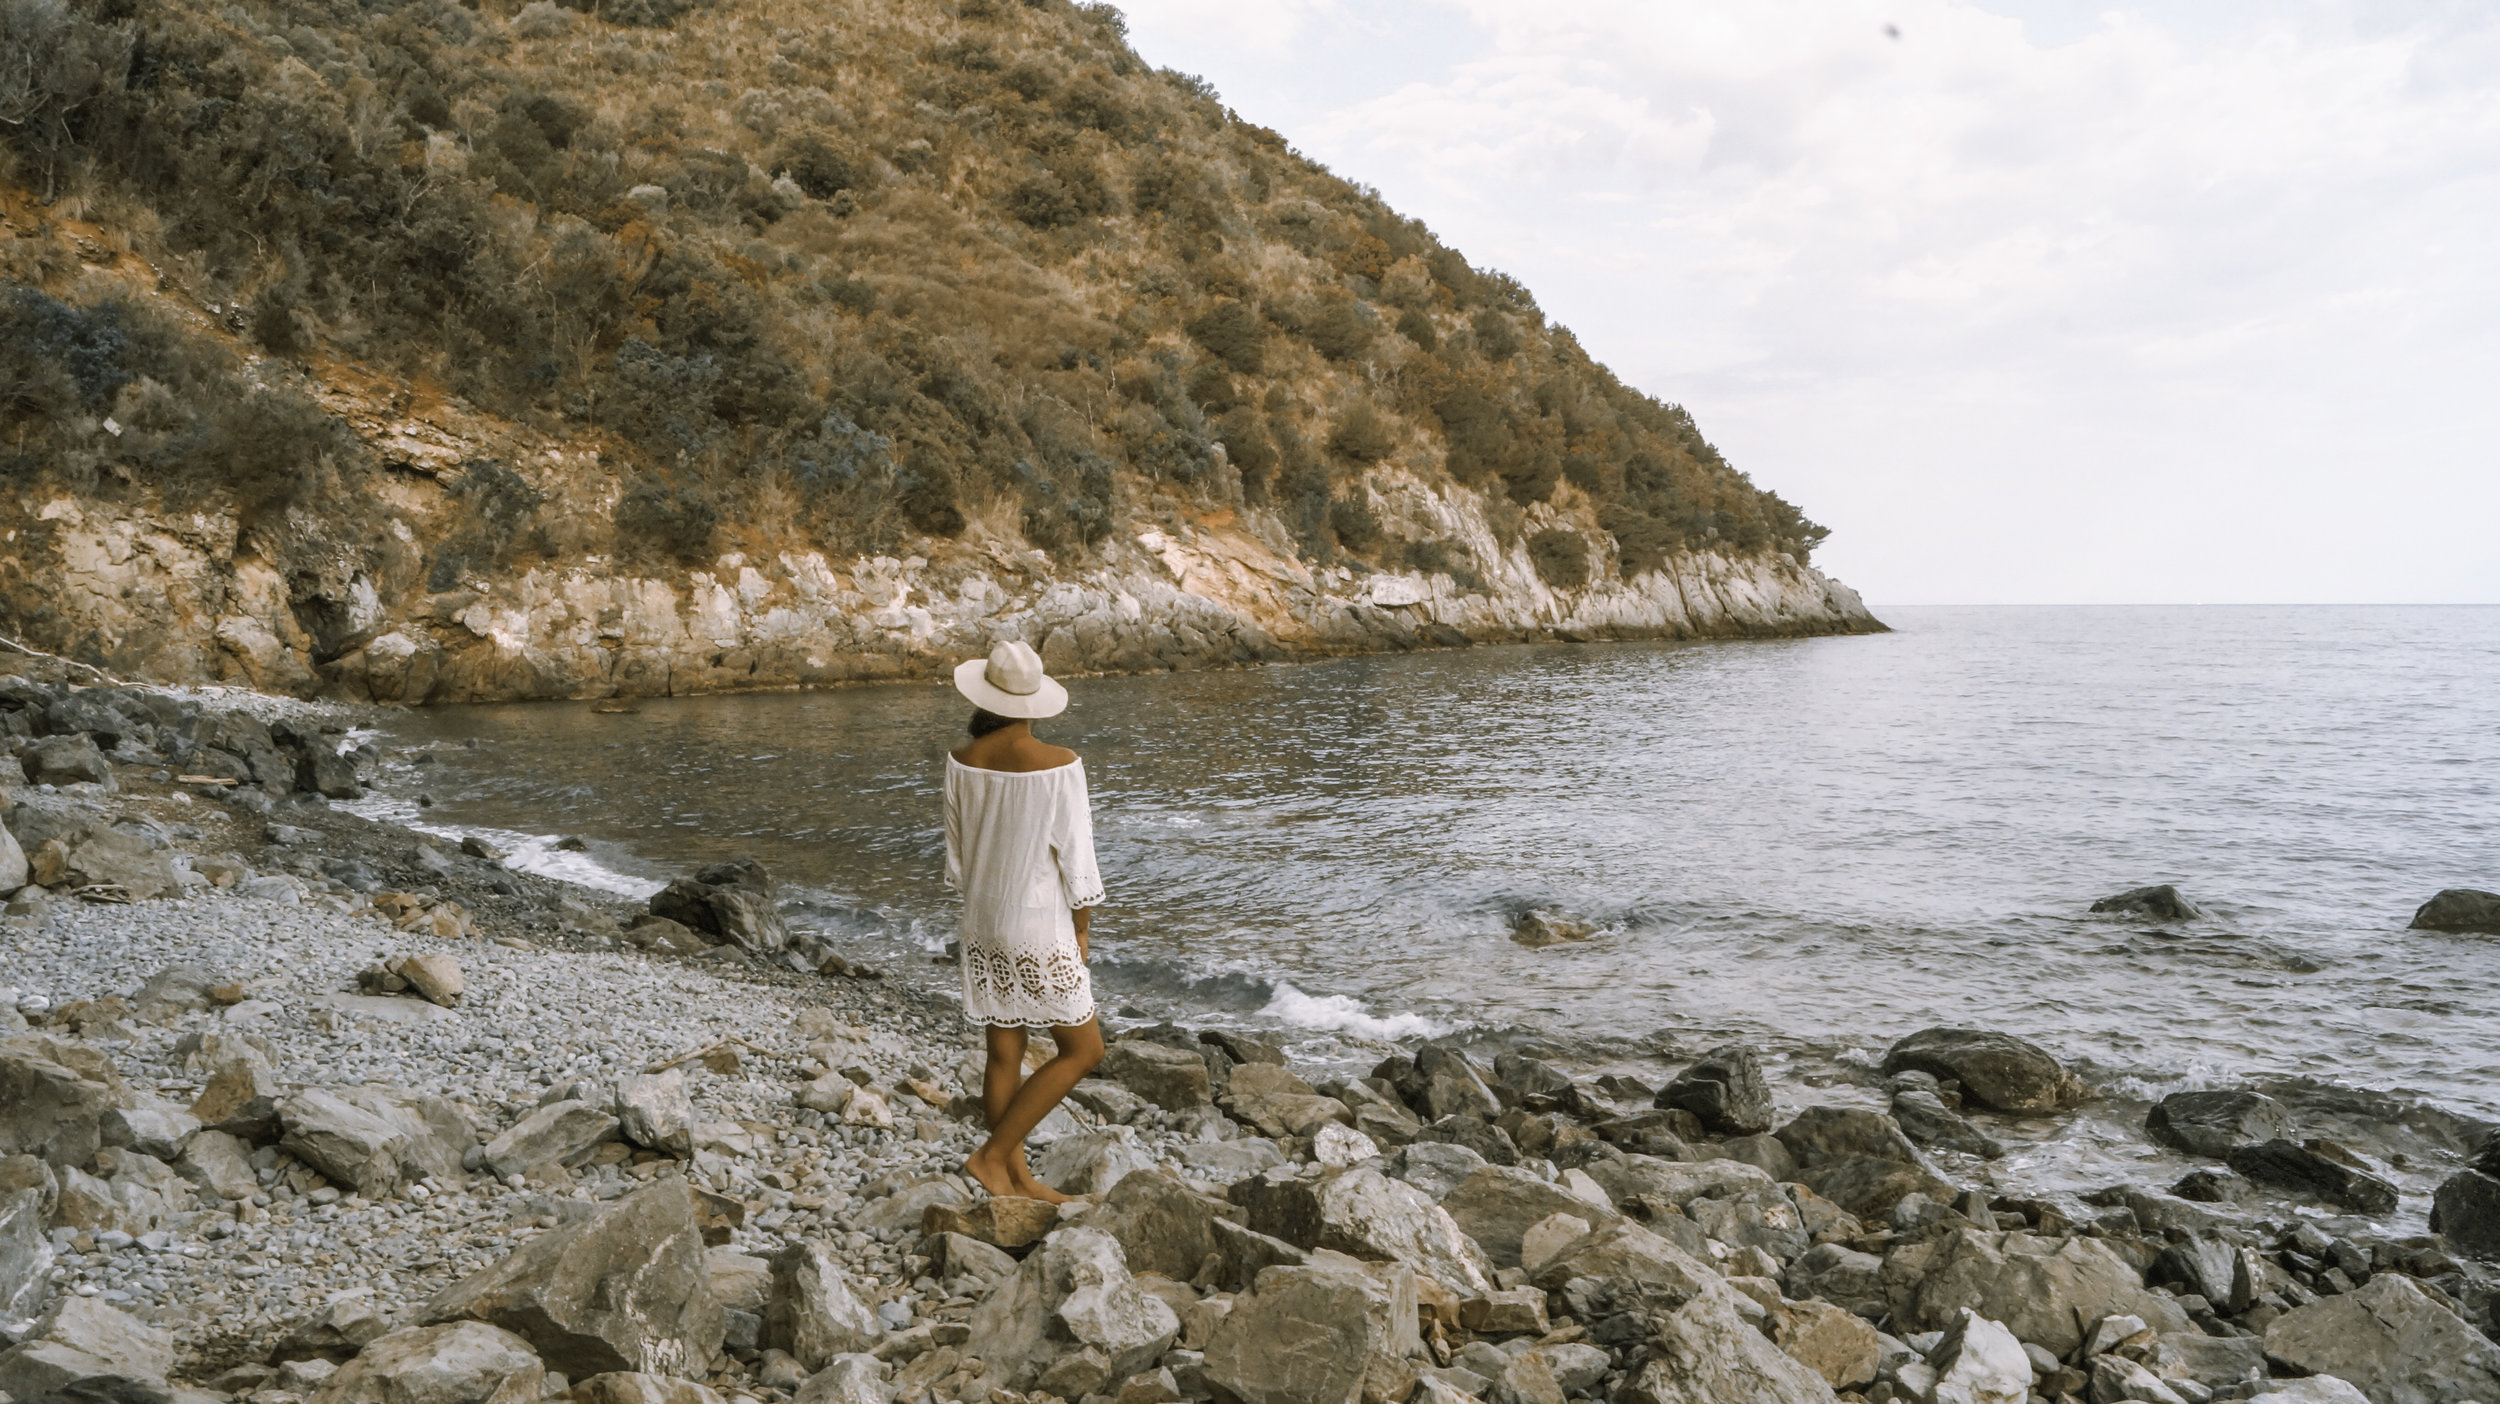 Monte Argentario, Tuscany Coast - Beach Vibes 6 - CocoBay x illumelation.jpg